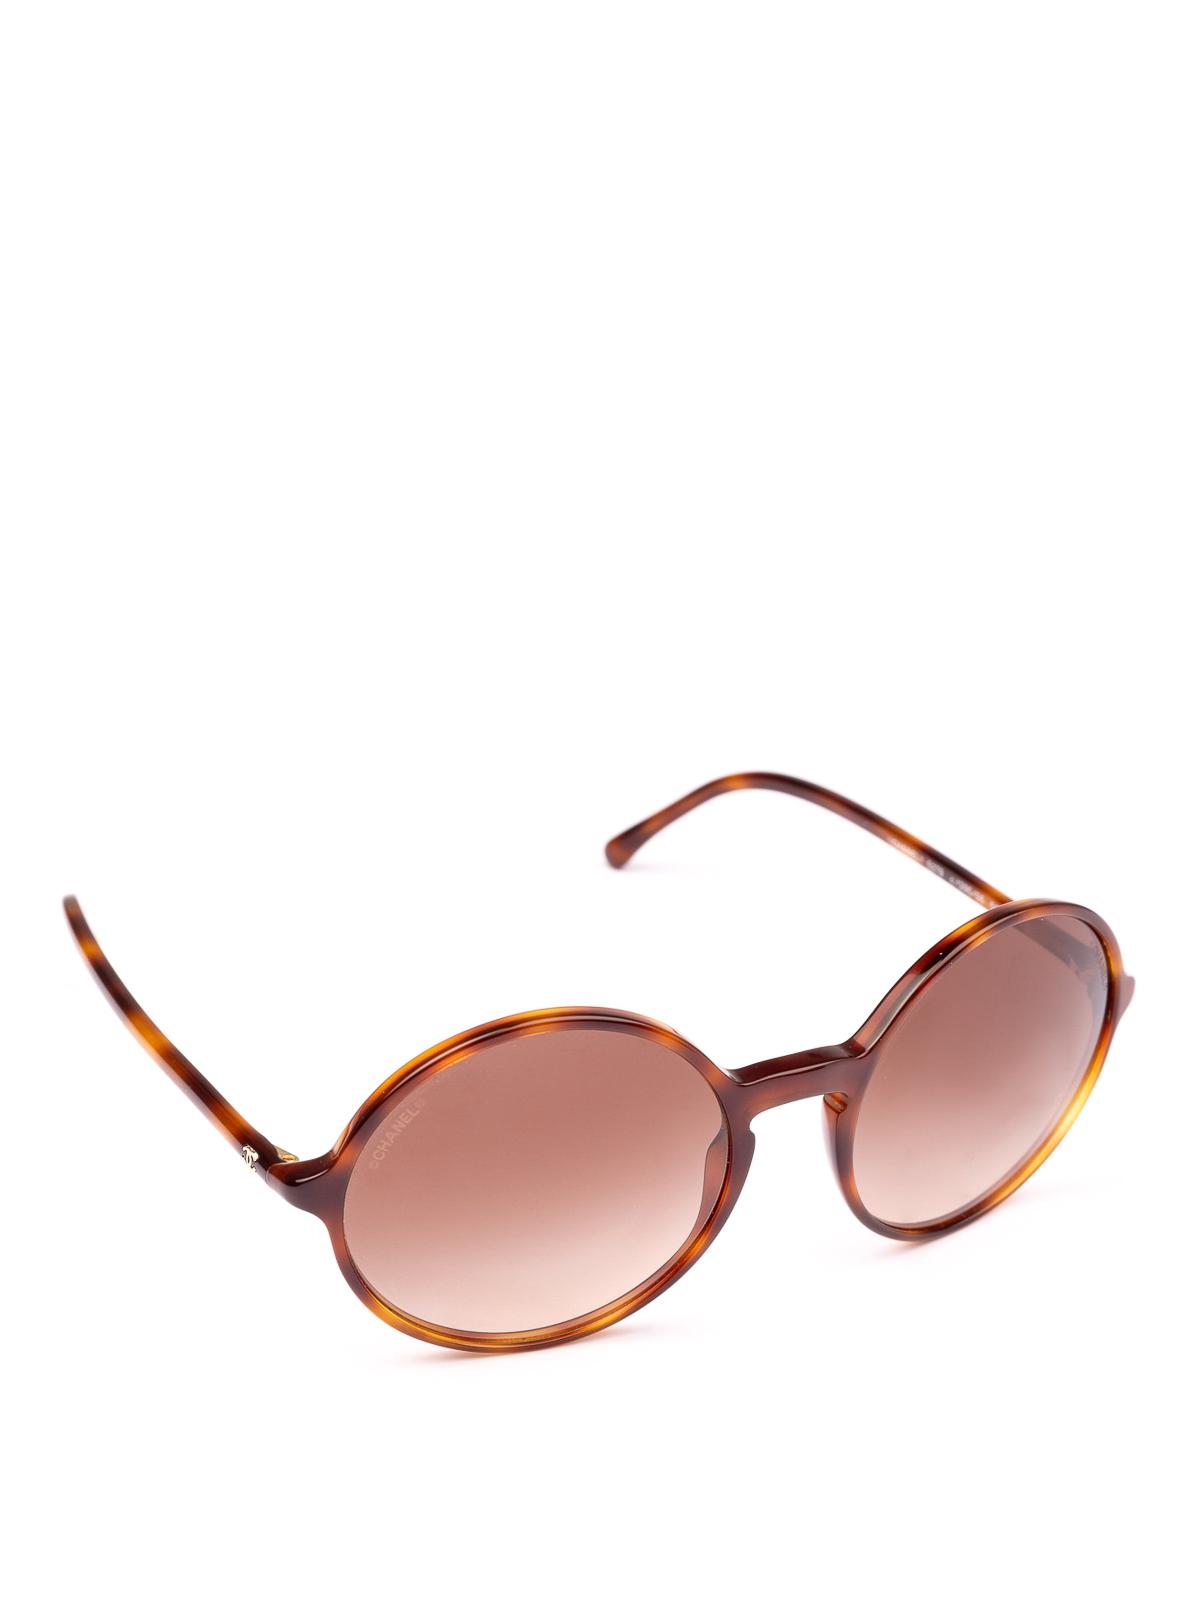 f334ab72673 Chanel - Light havana full rim round sunglasses - sunglasses - 5279 ...